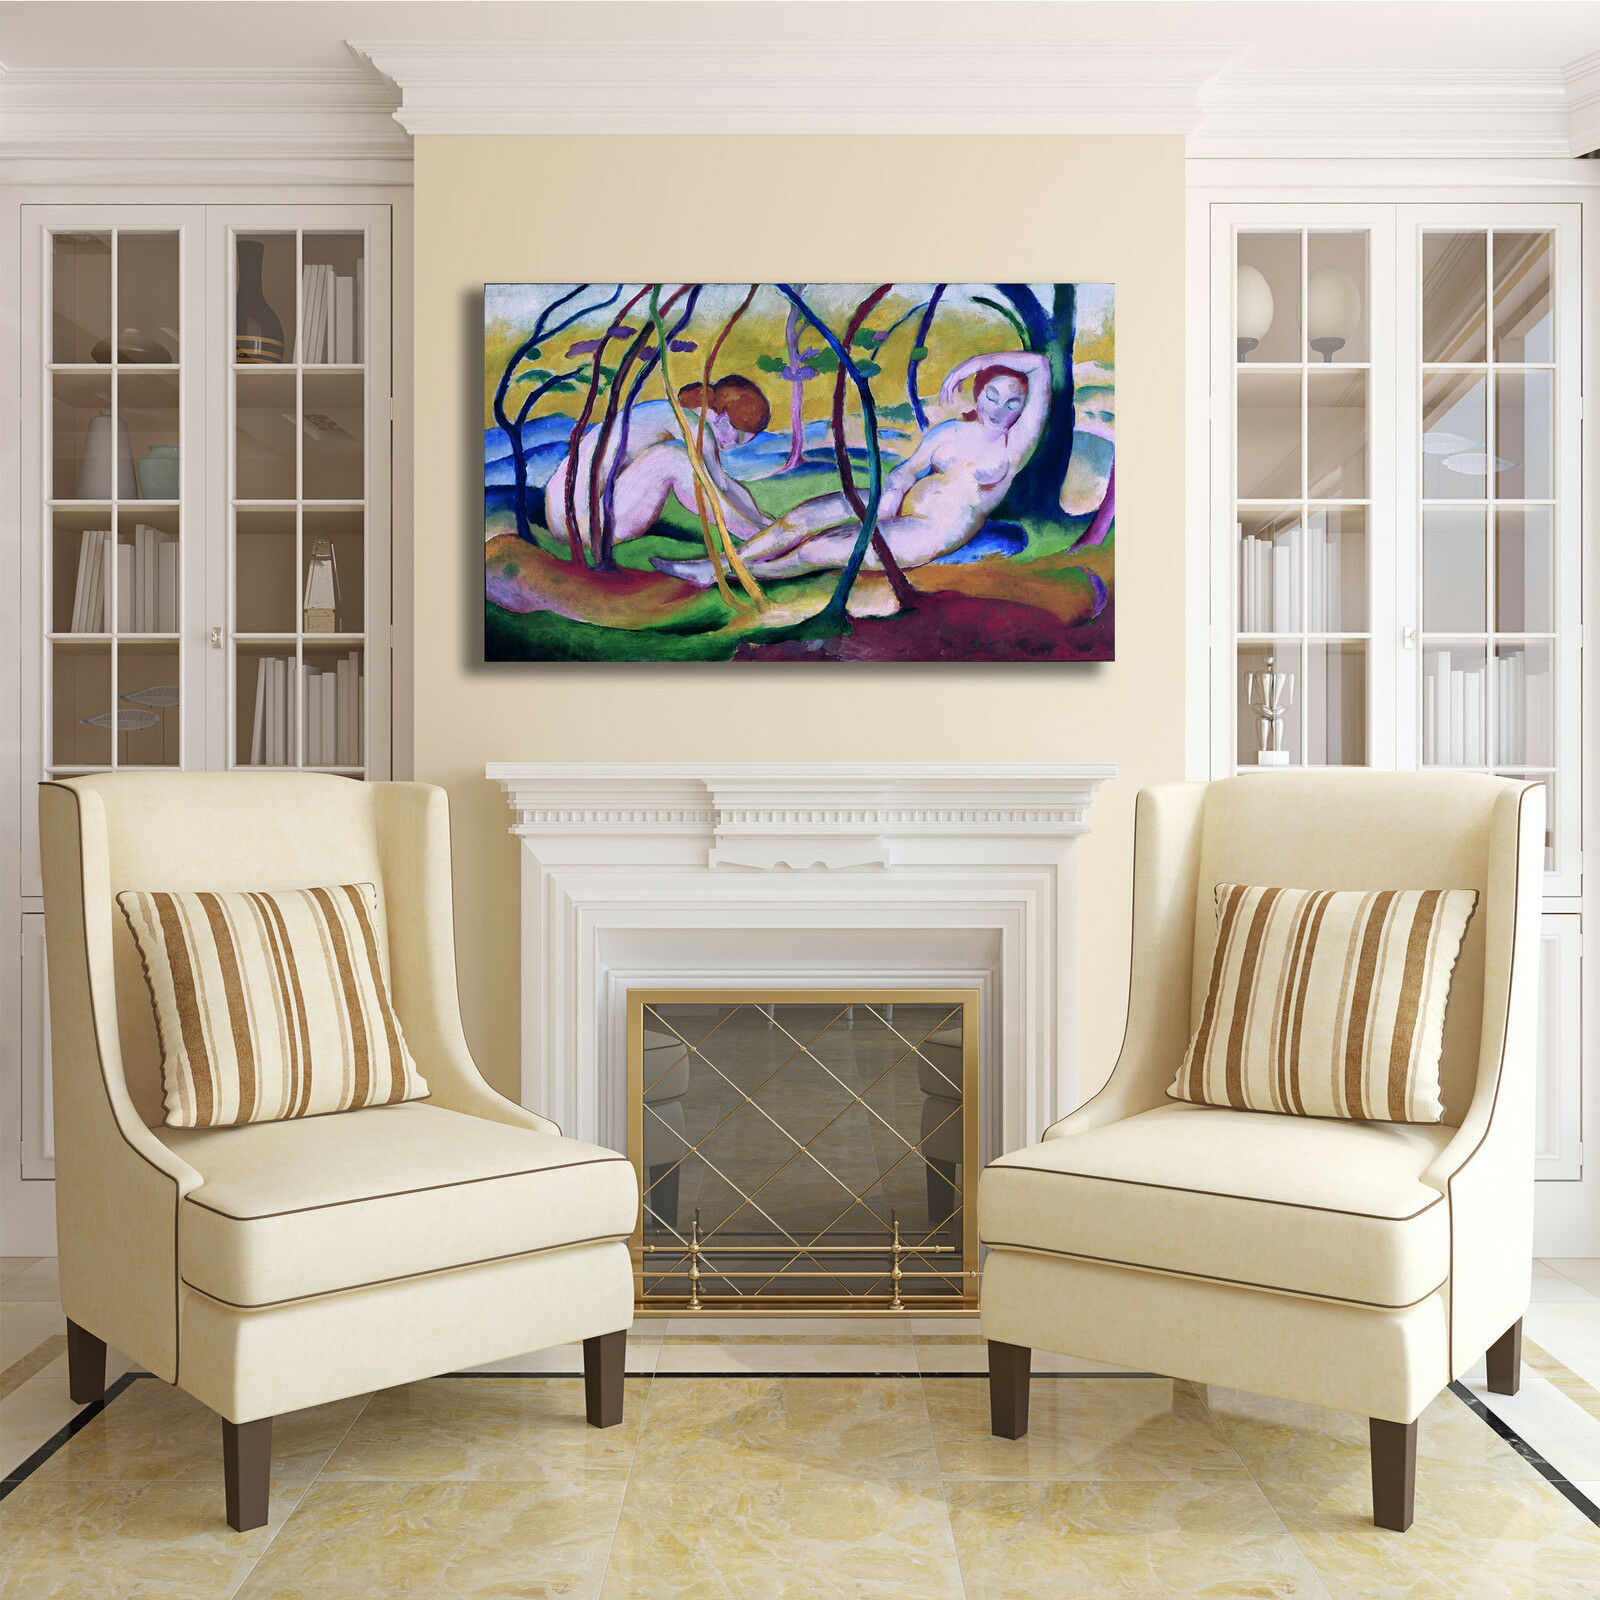 Franz Marc nudi sotto gli alberi quadro stampa tela tela tela dipinto telaio arRouge o casa aecaf9